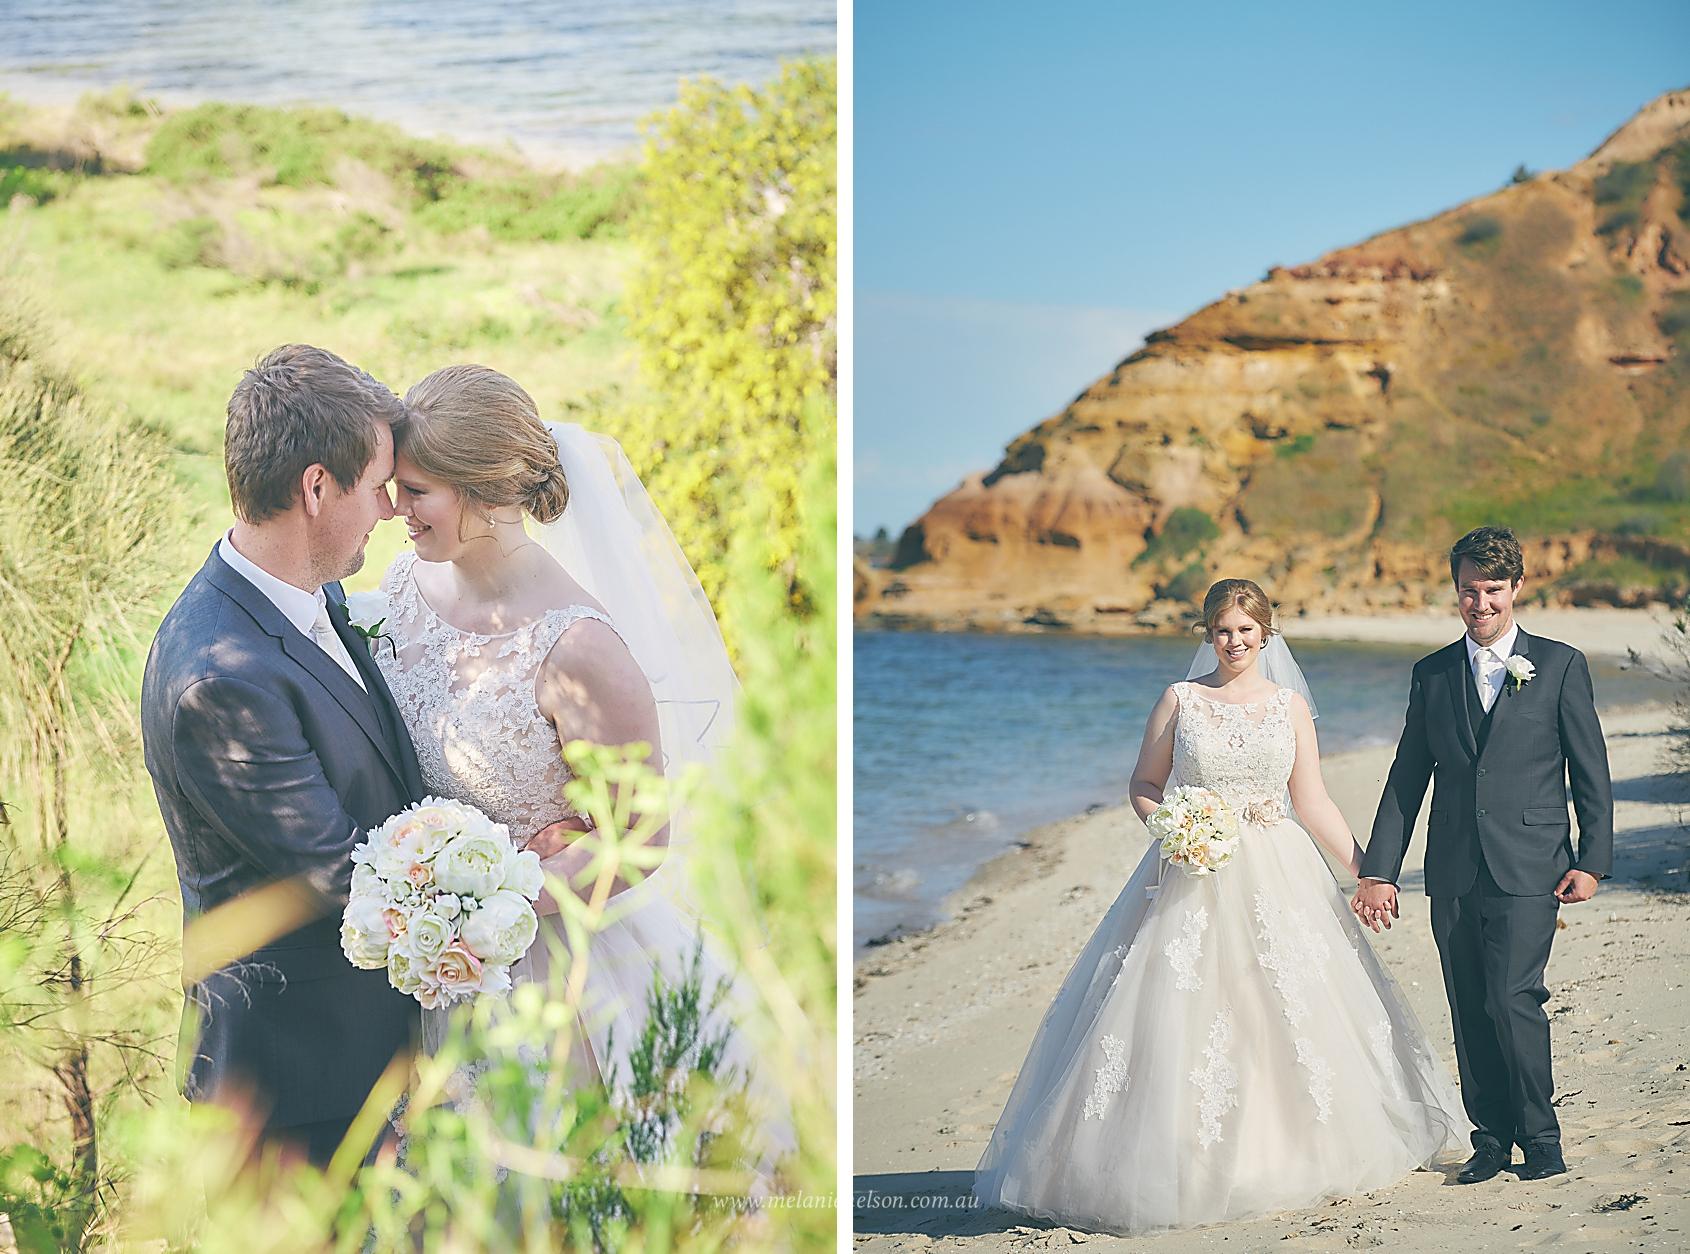 yorke_peninsula_wedding_photographer_0050.jpg